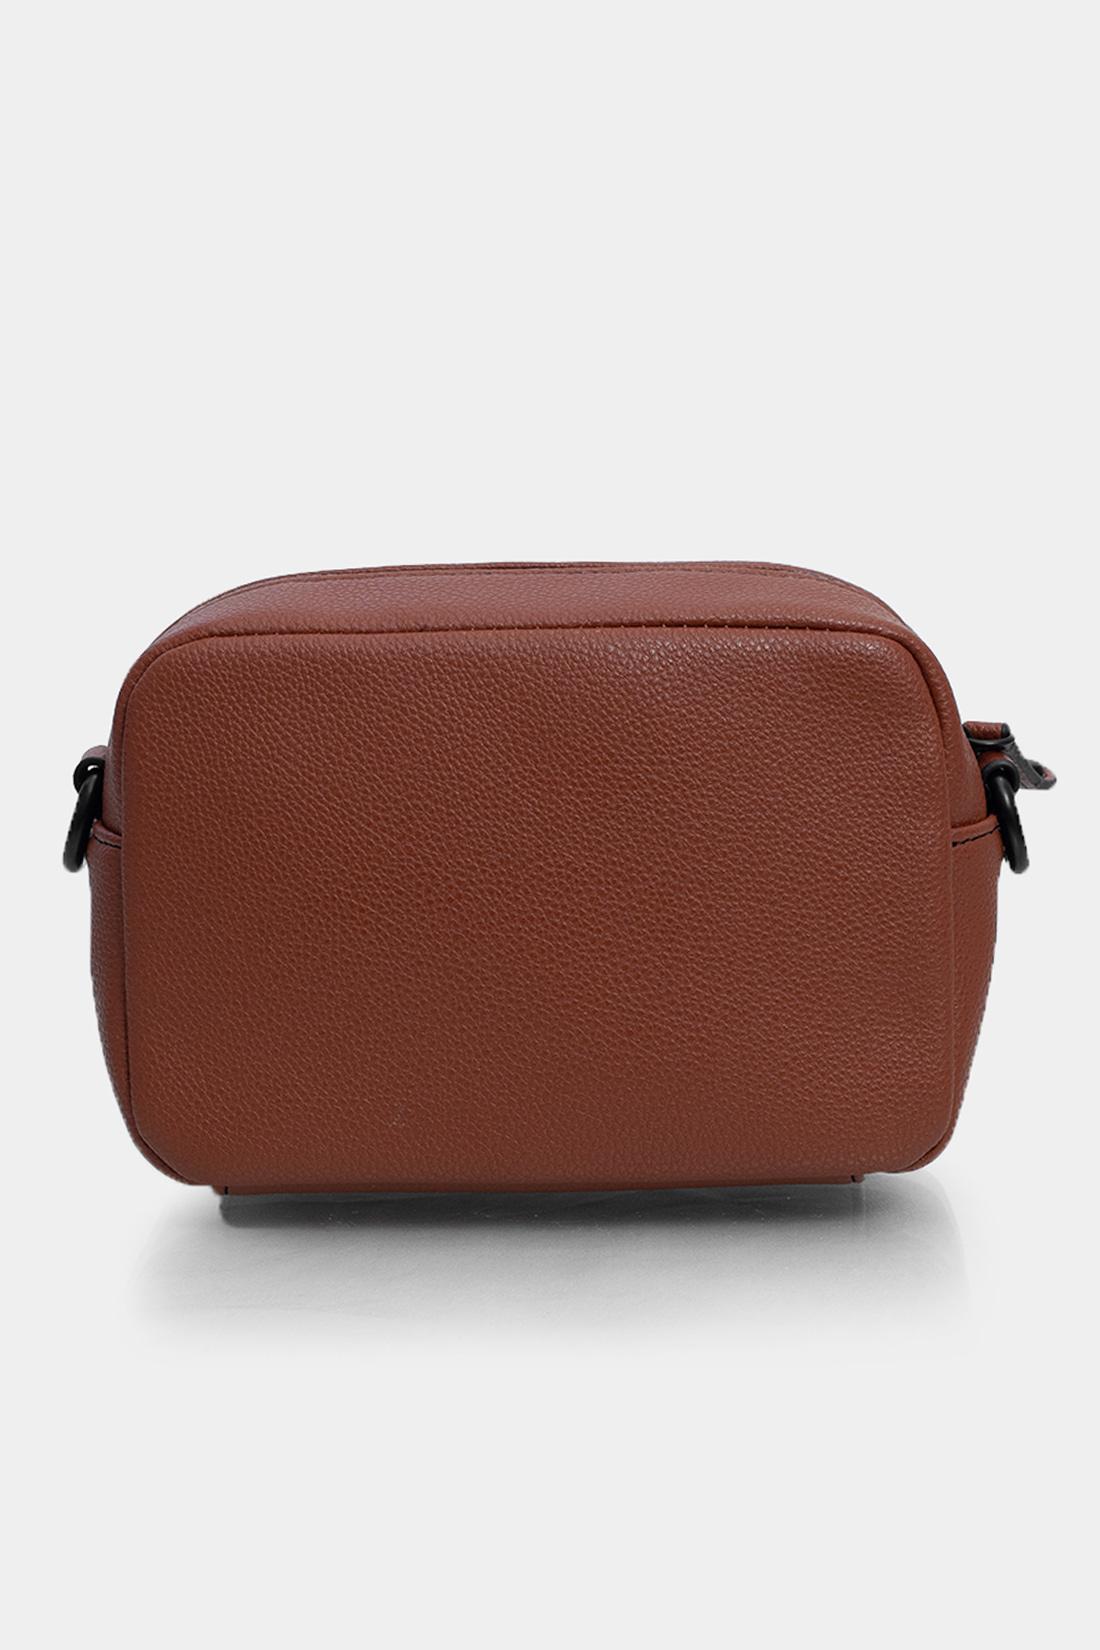 Bolsa Colcci Camera Bag Esportiva